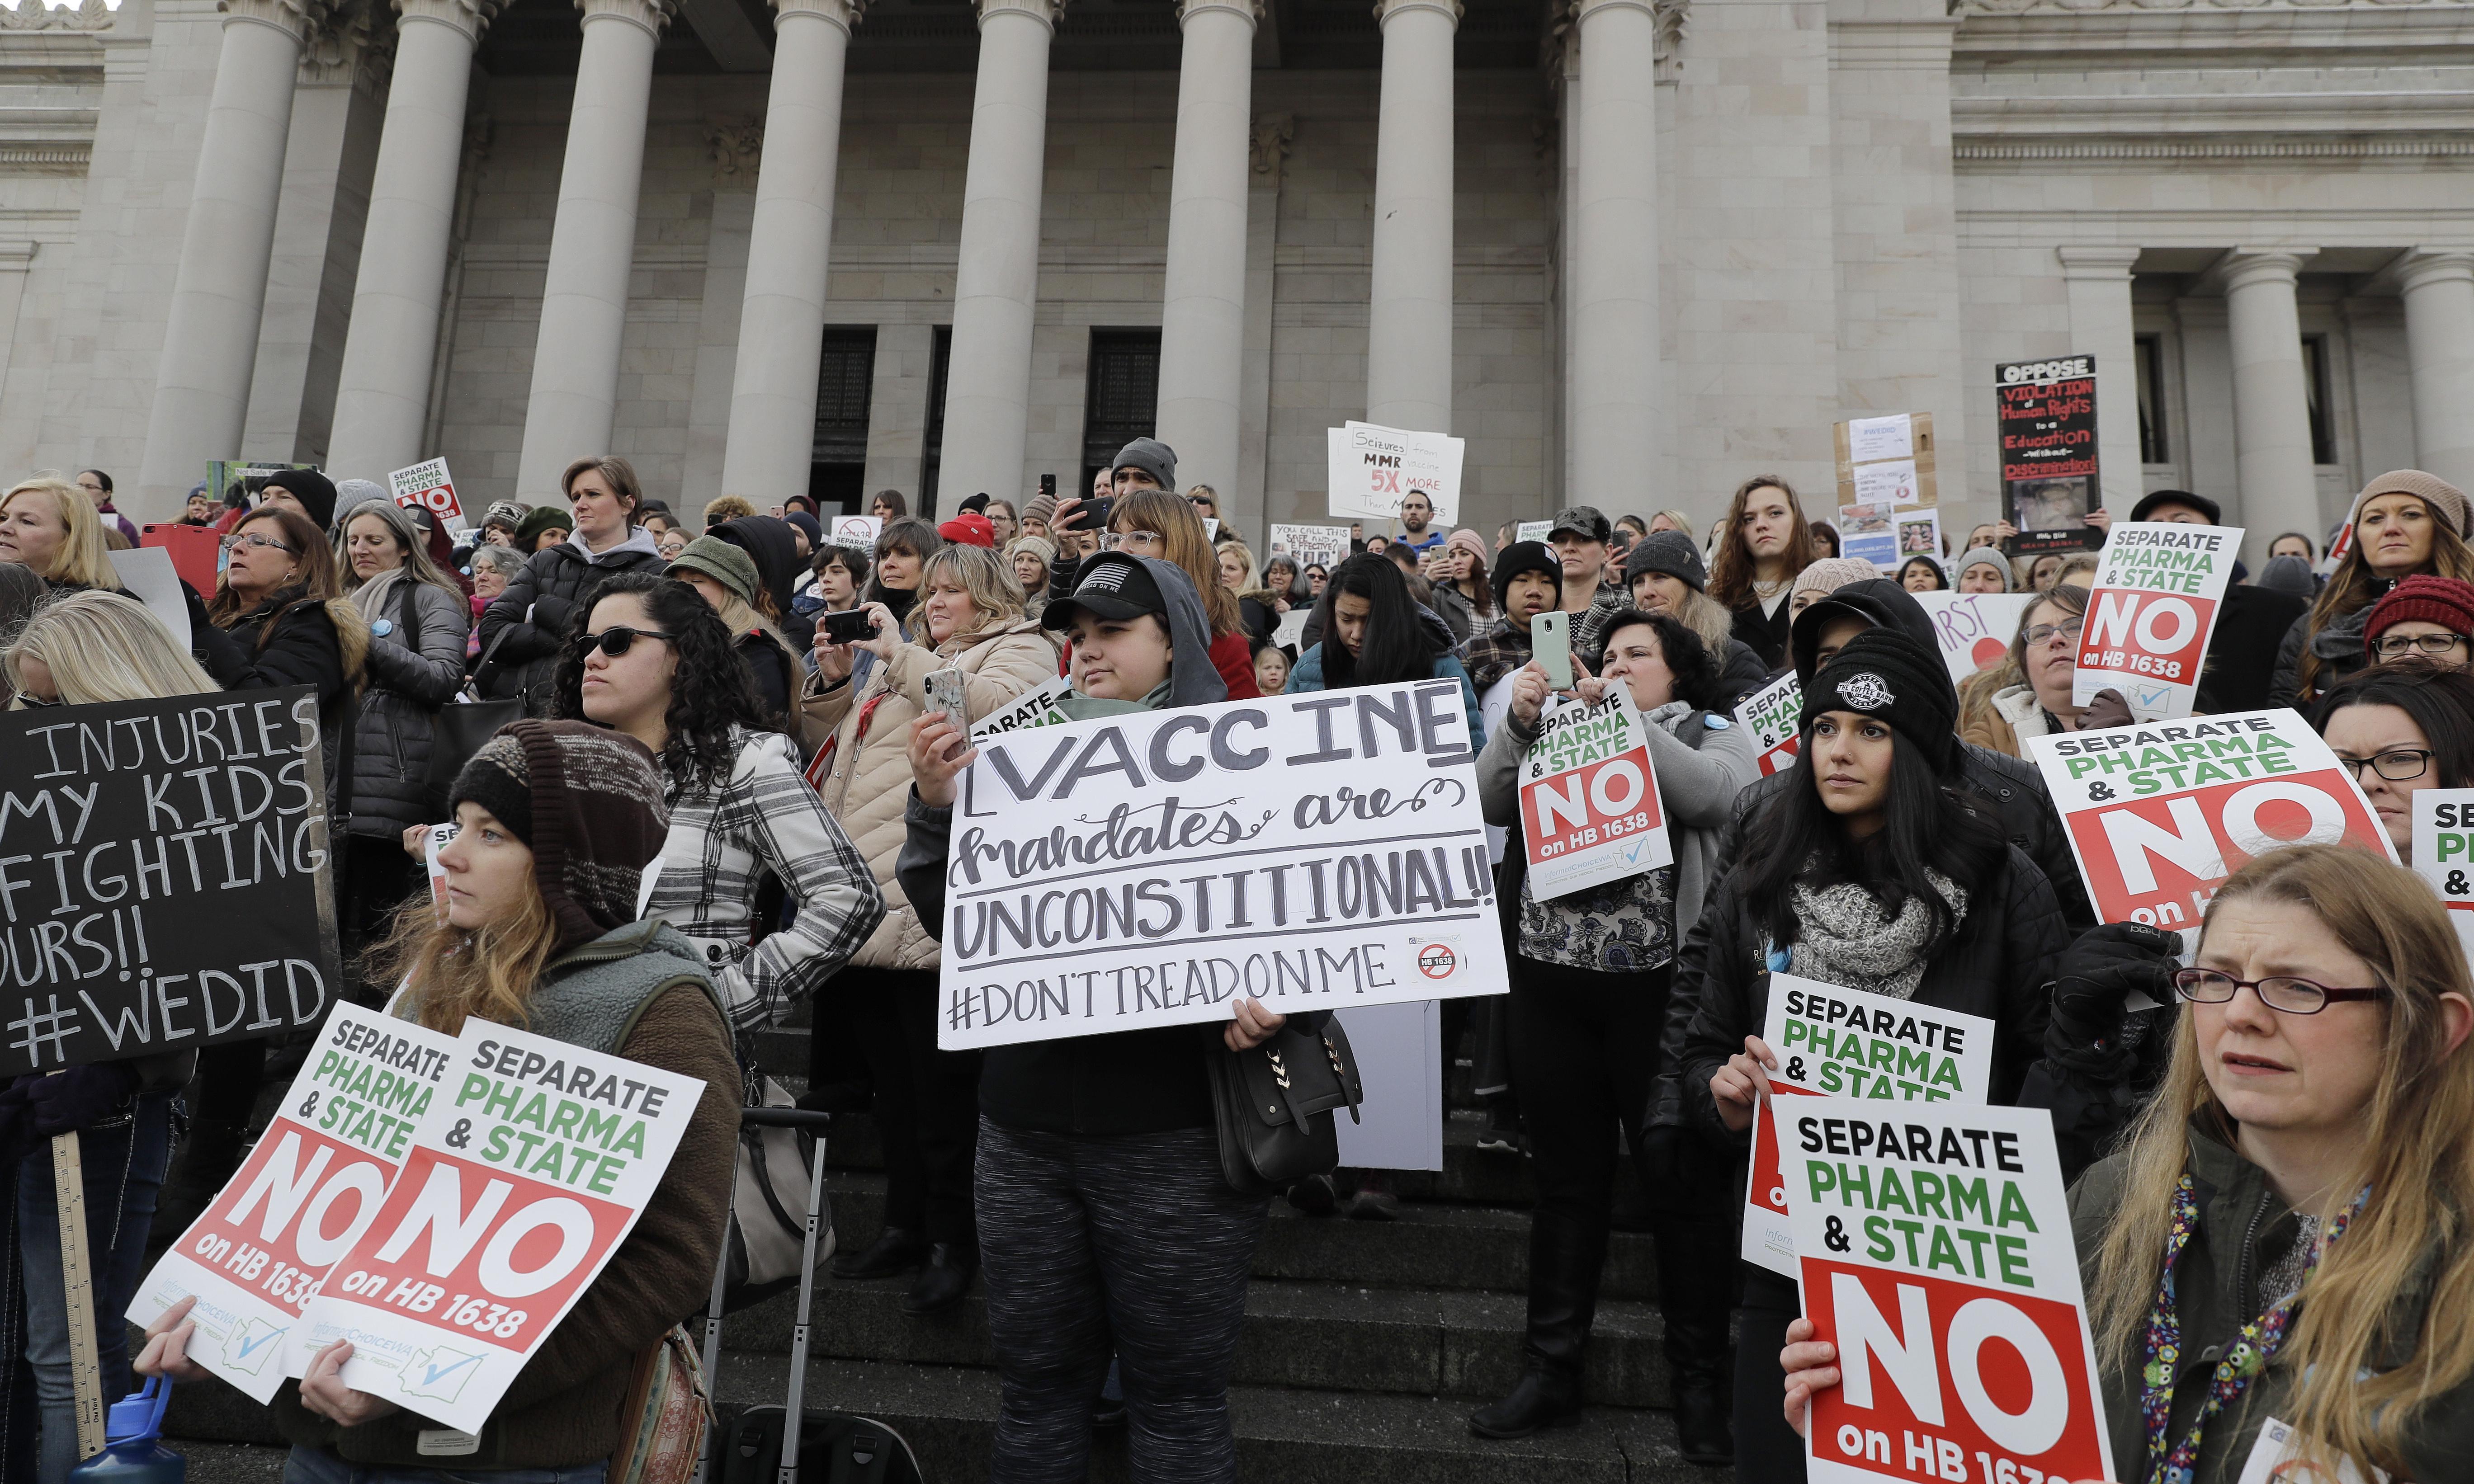 Facebook under pressure to halt rise of anti-vaccination groups